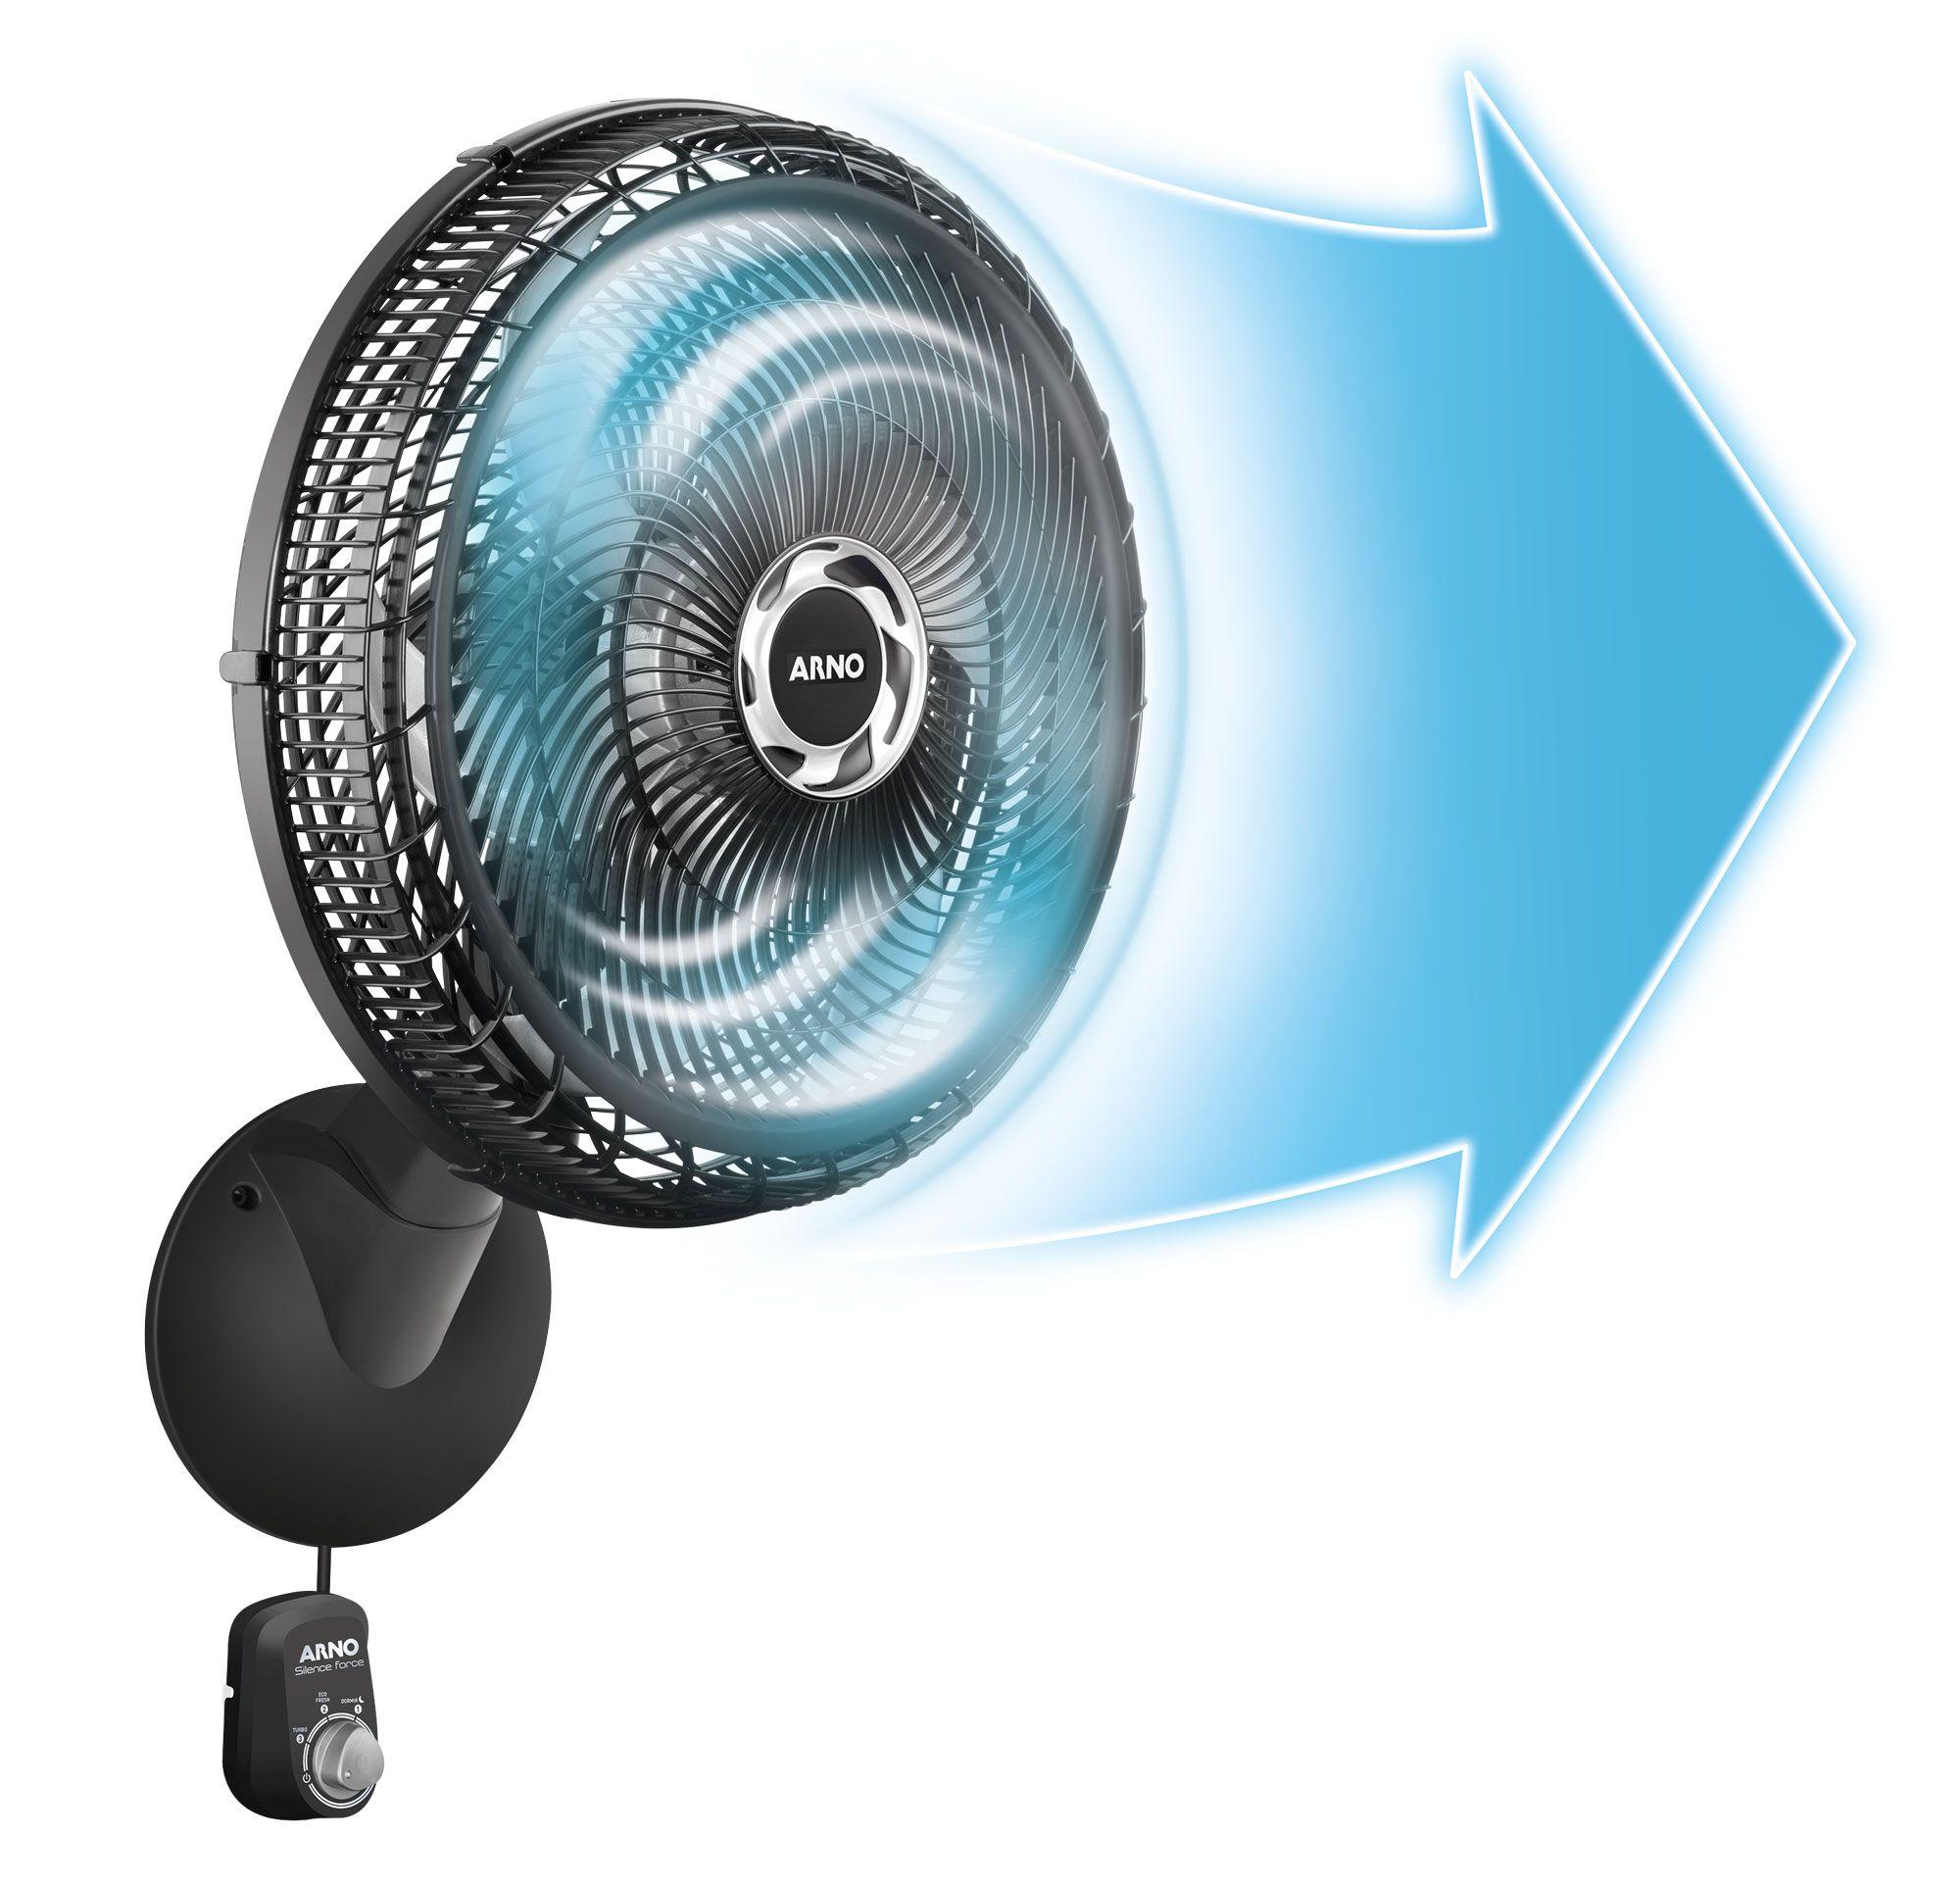 Ventilador Arno Silence Force - VF51 50cm Parede Preto